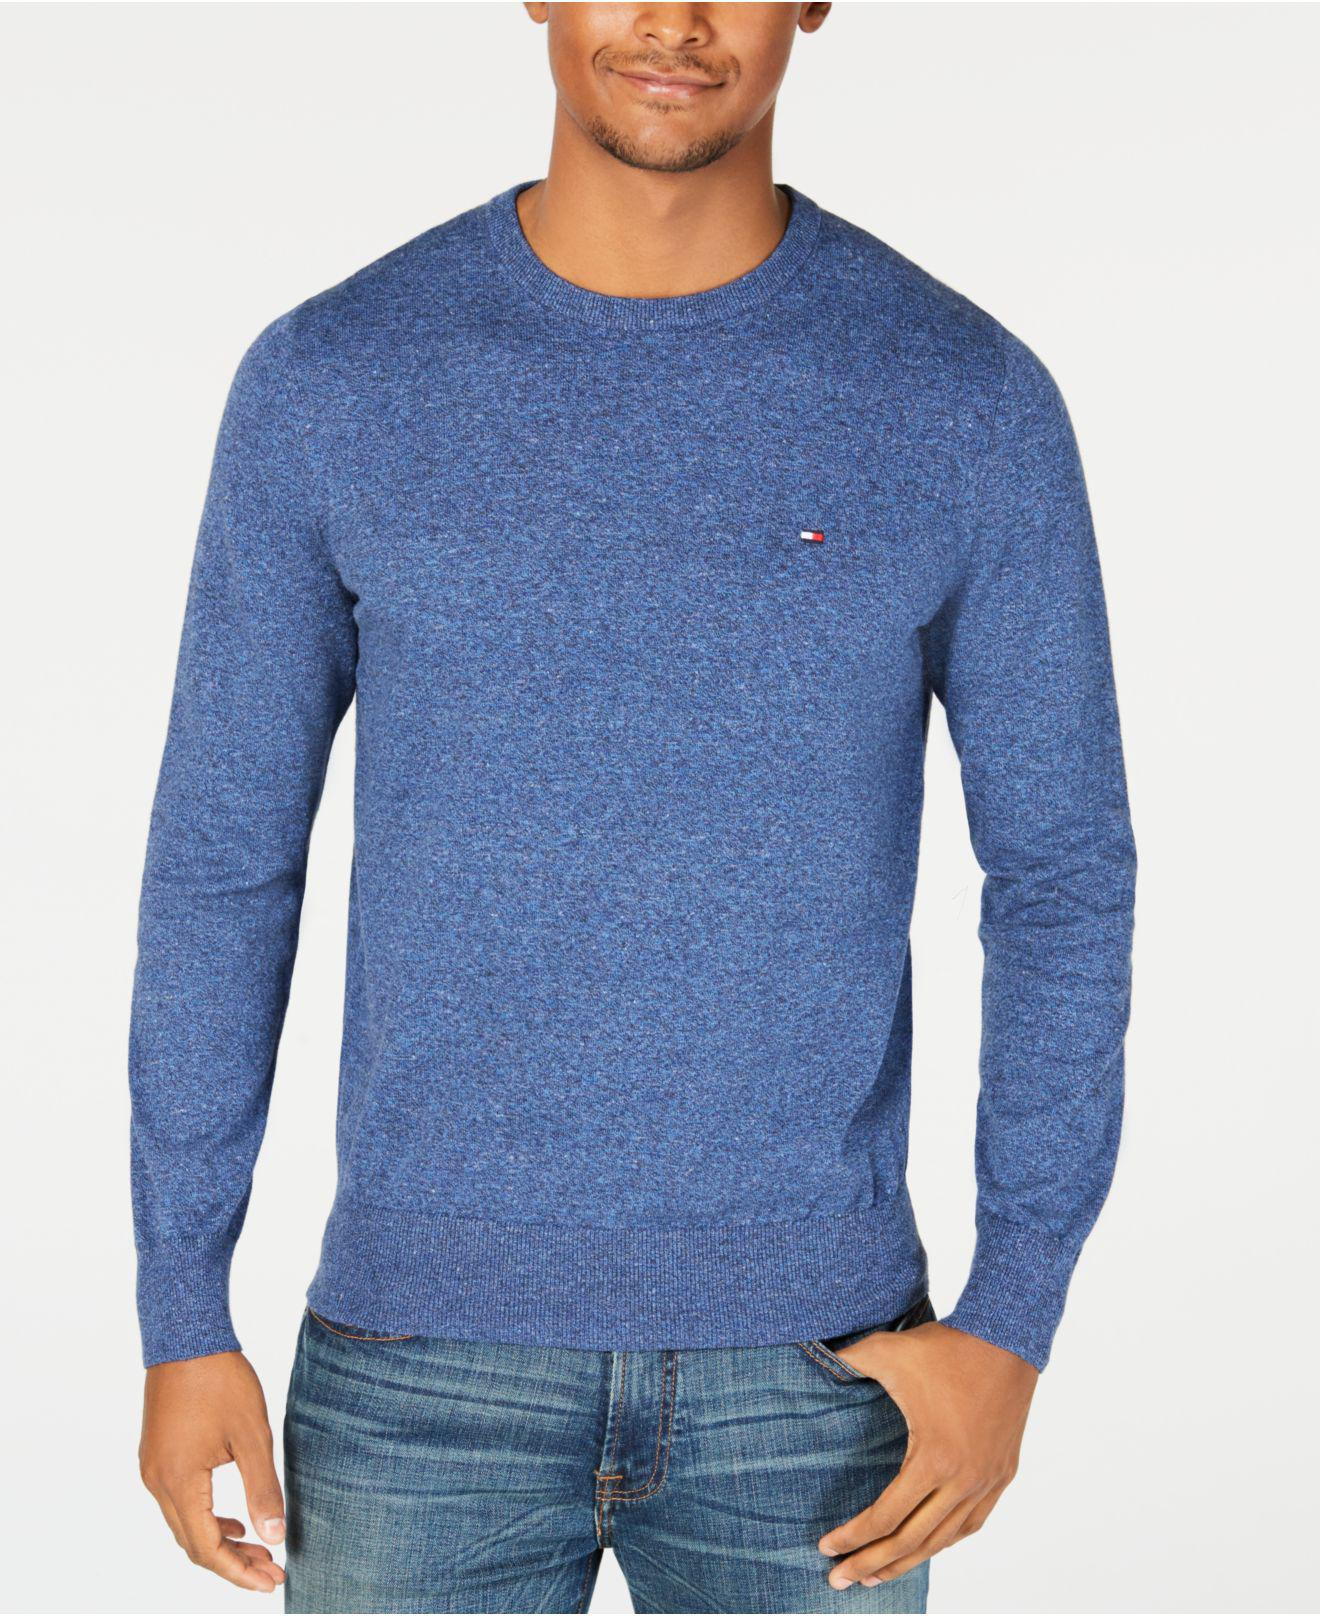 d24ef3631c Lyst - Tommy Hilfiger Prep Crew Neck Sweater in Blue for Men